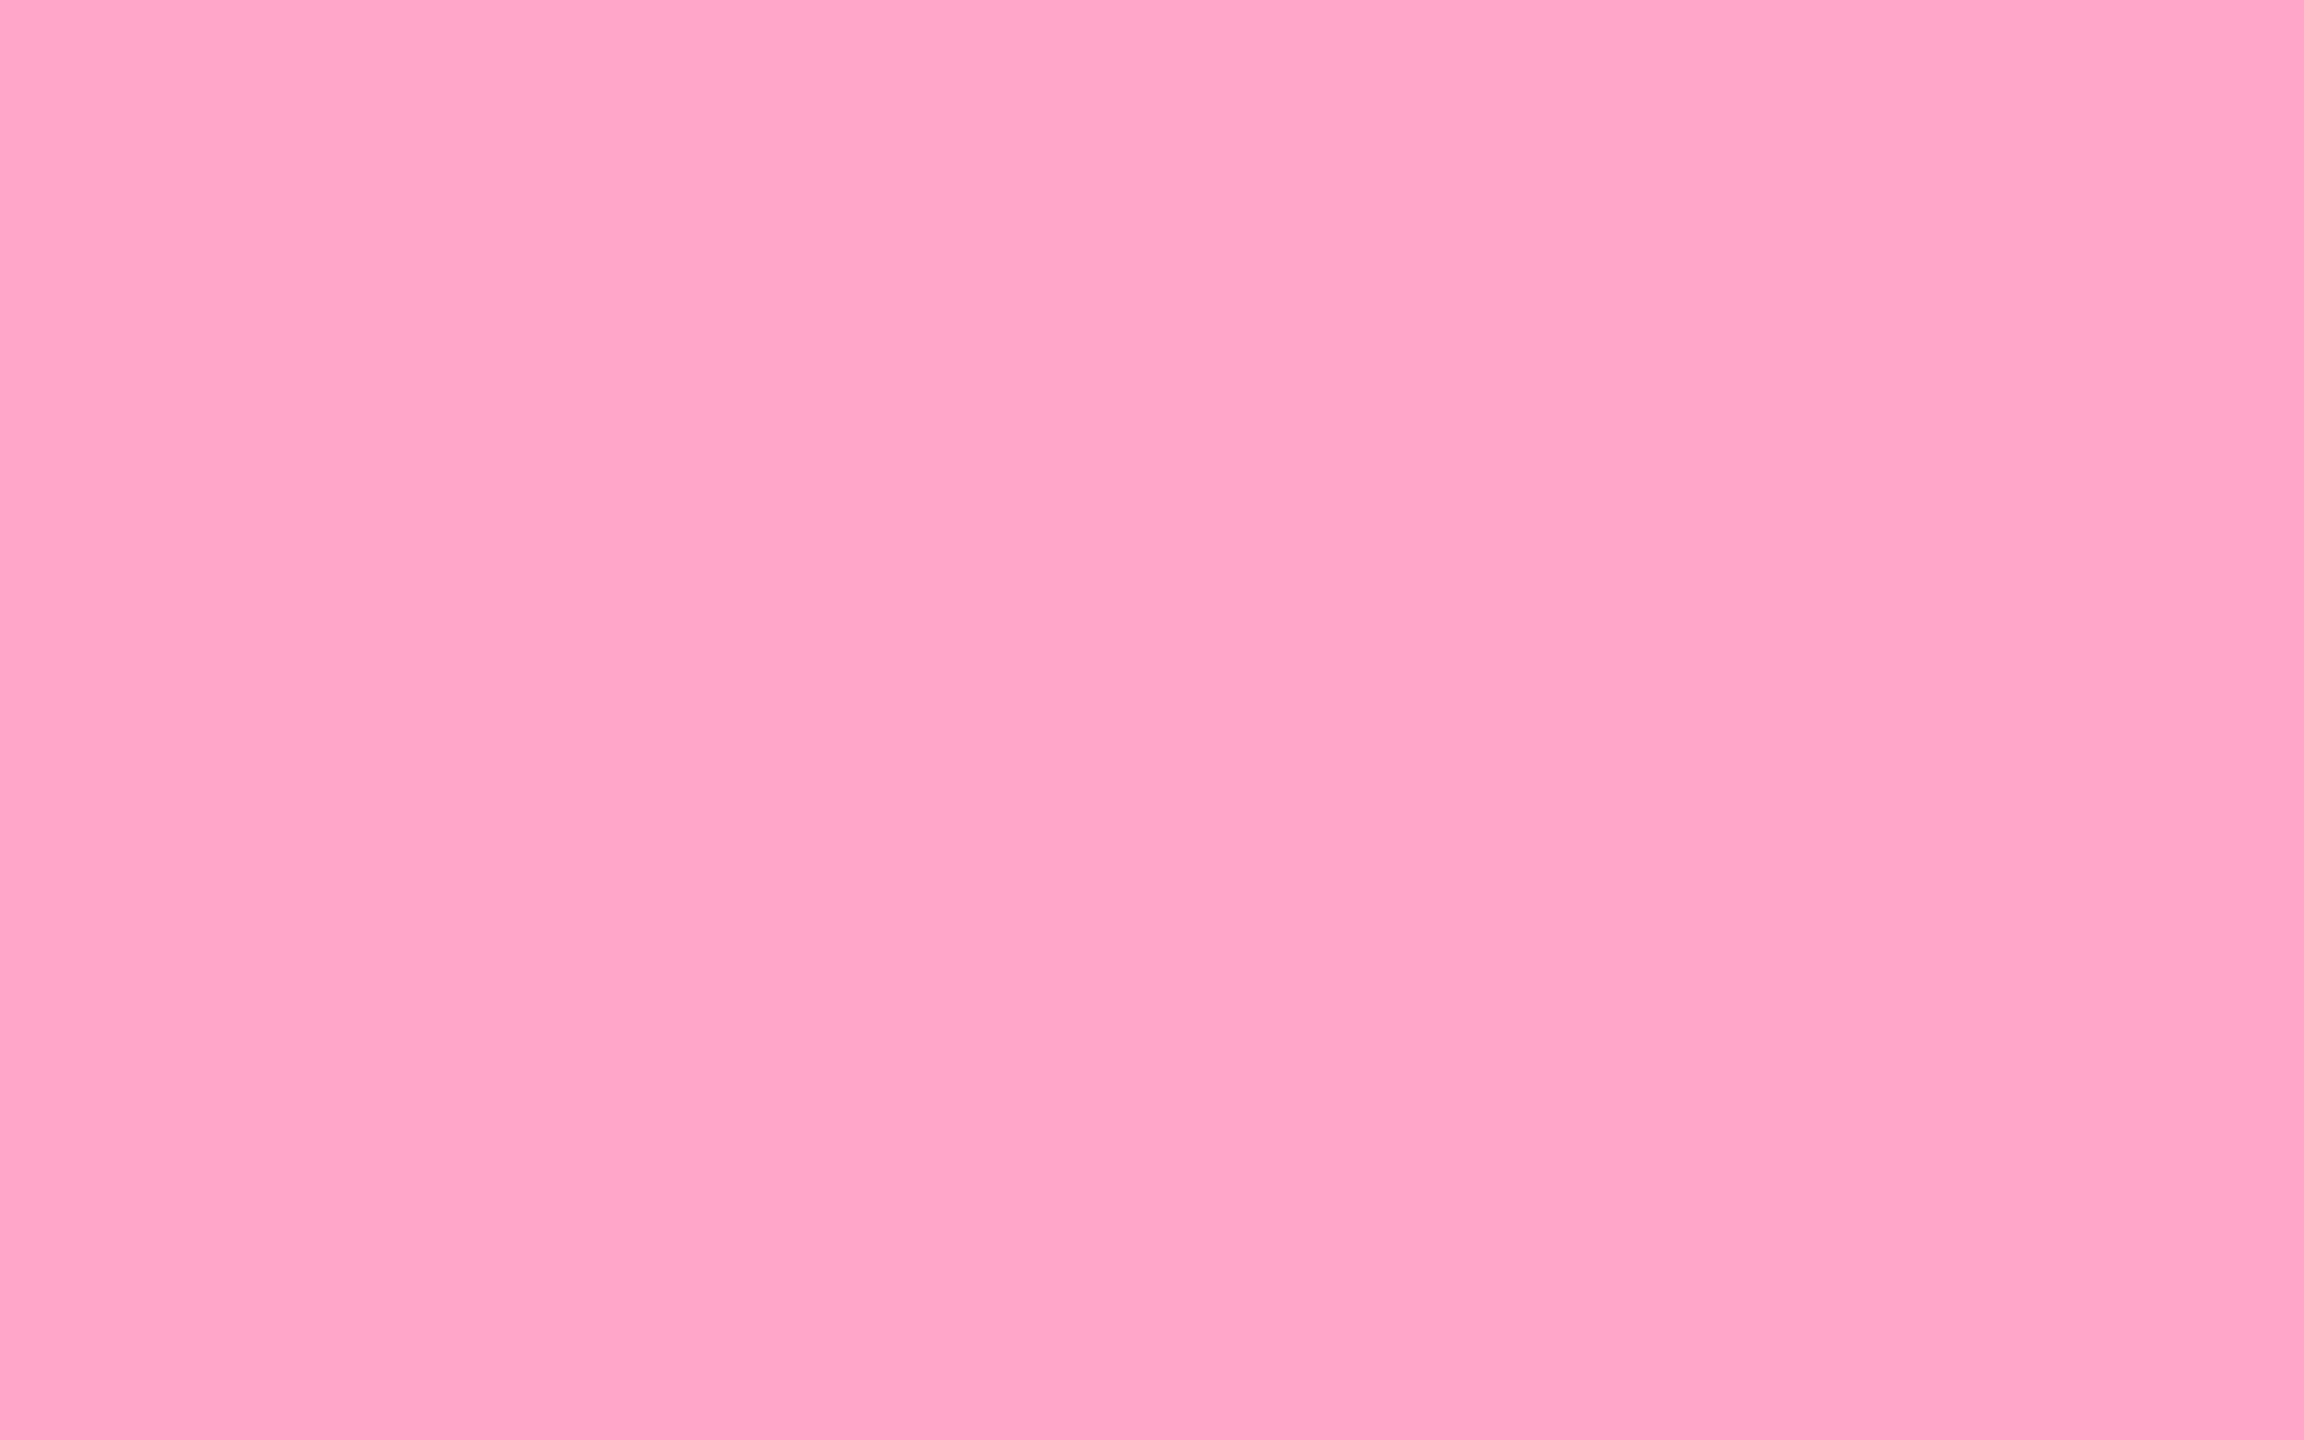 2304x1440 Carnation Pink Solid Color Background